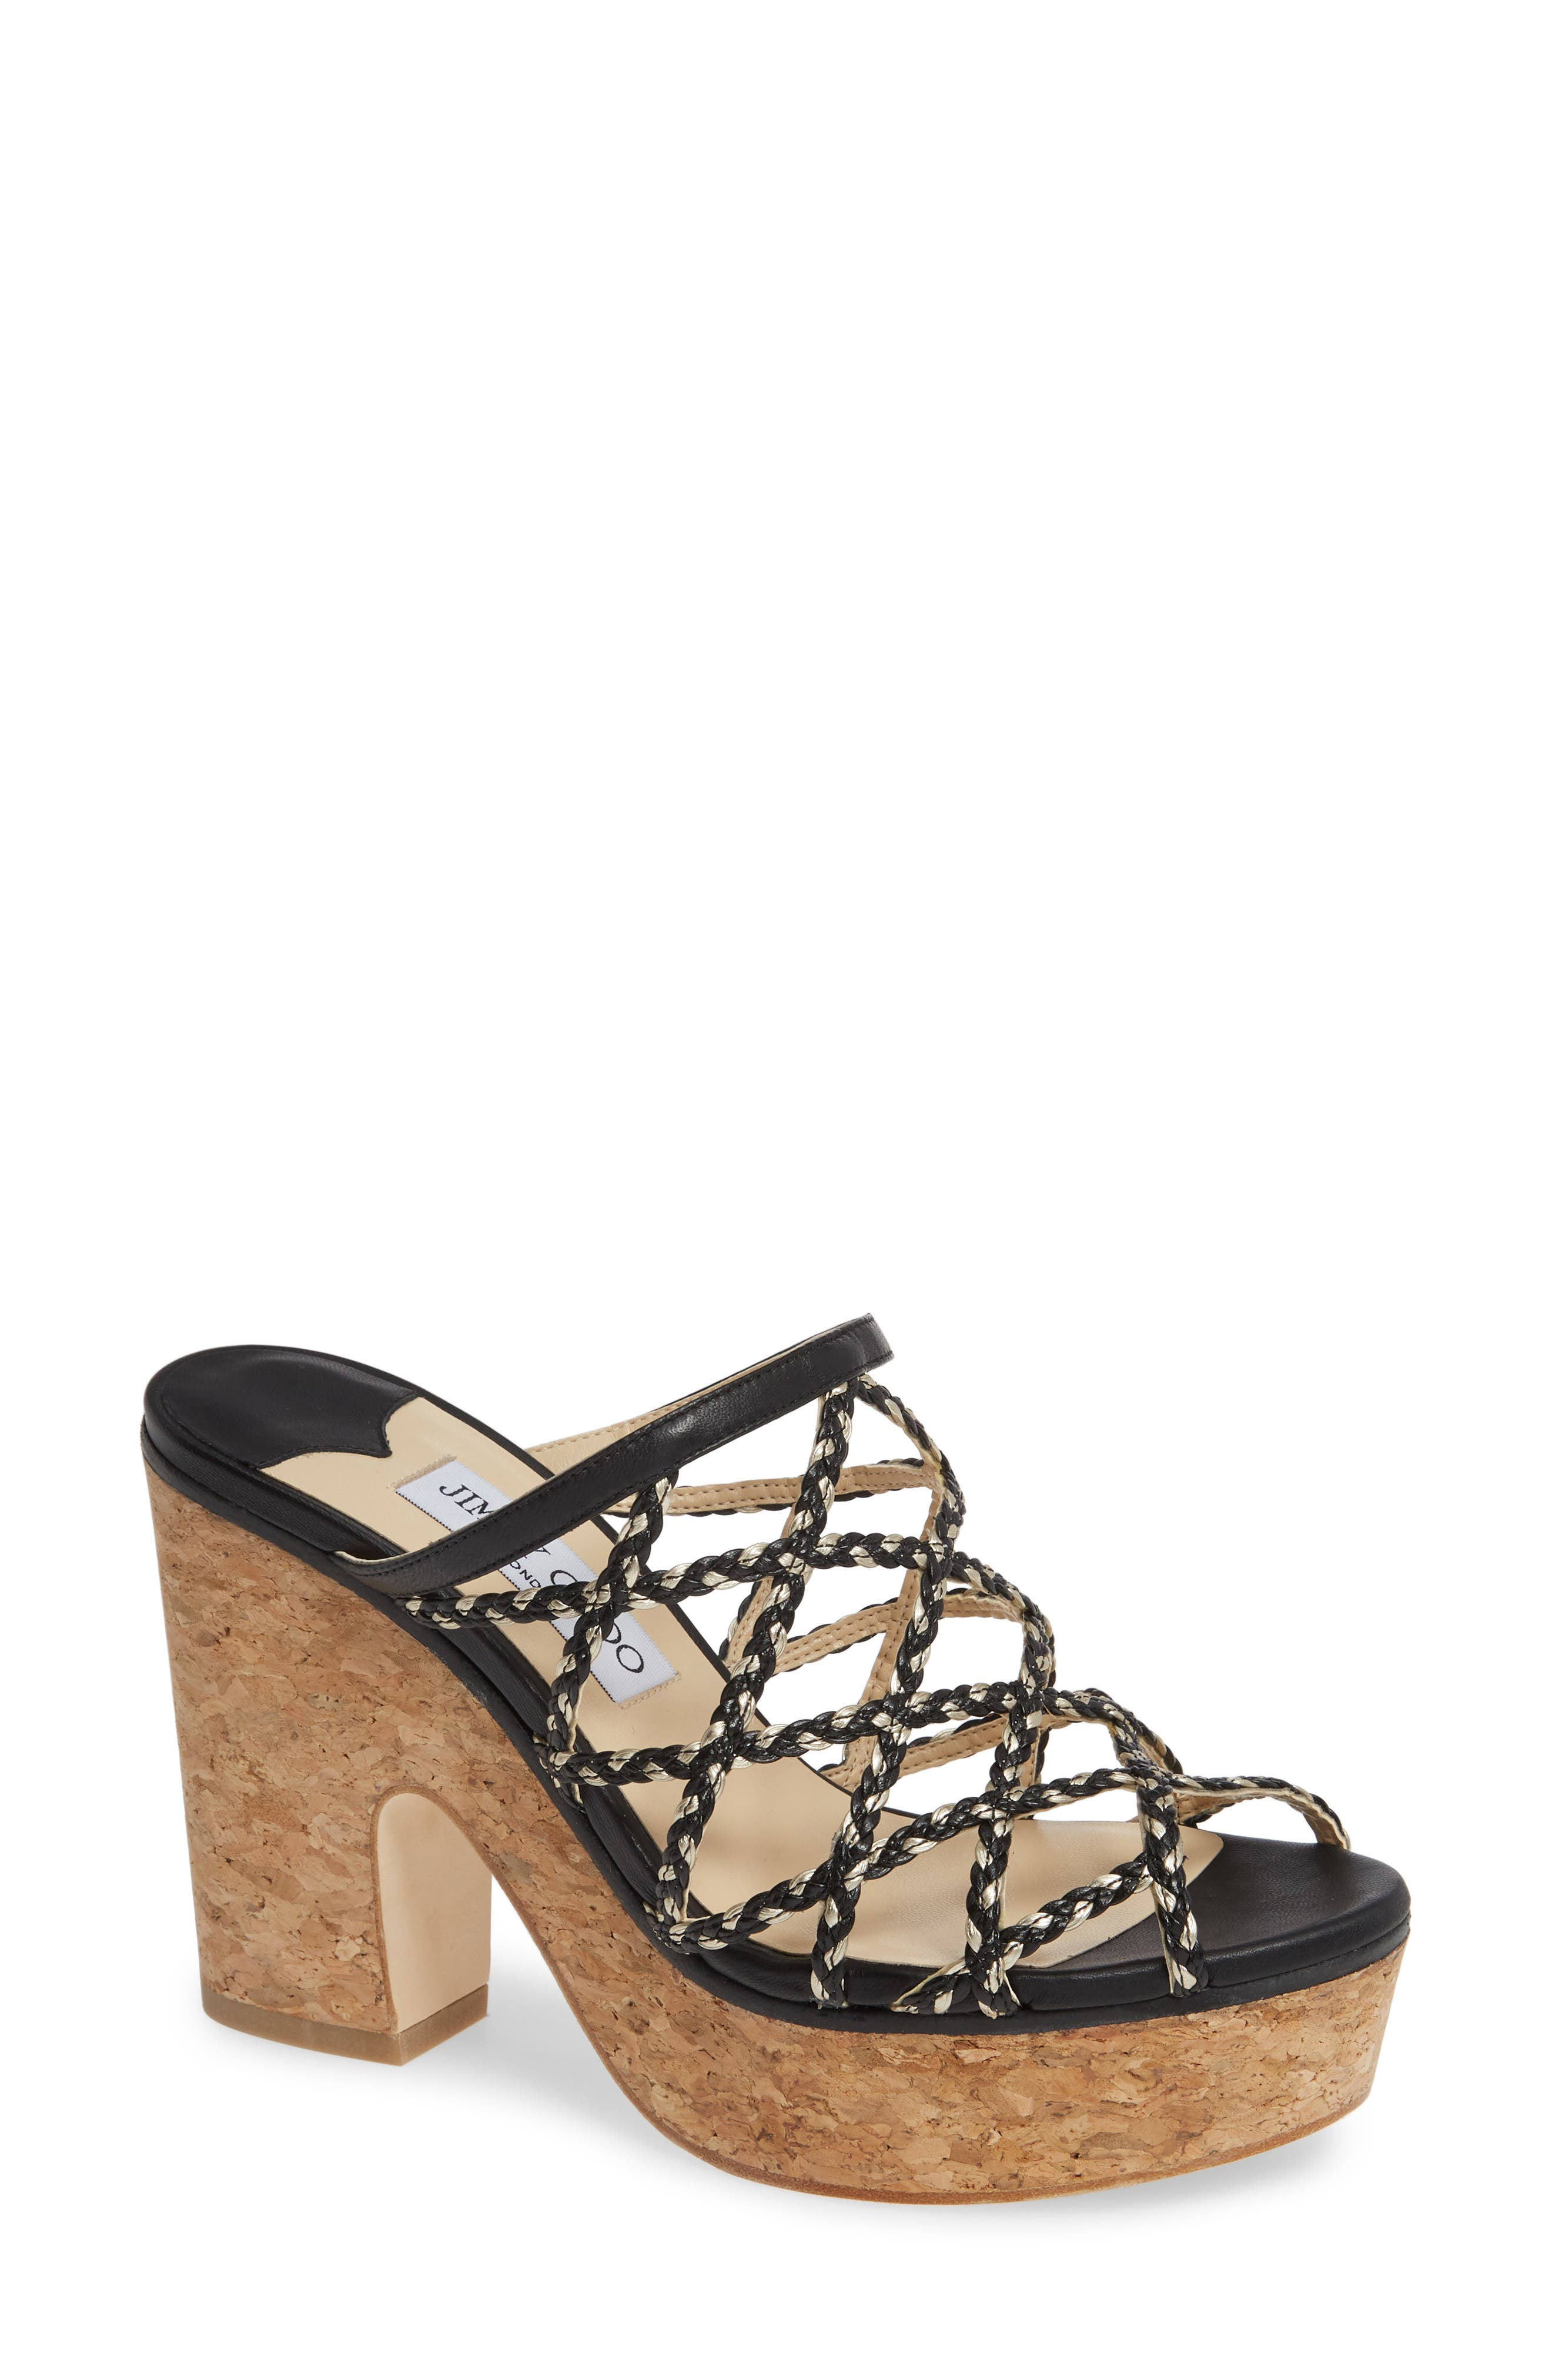 Jimmy Choo Dallina Platform Slide Sandal, Black